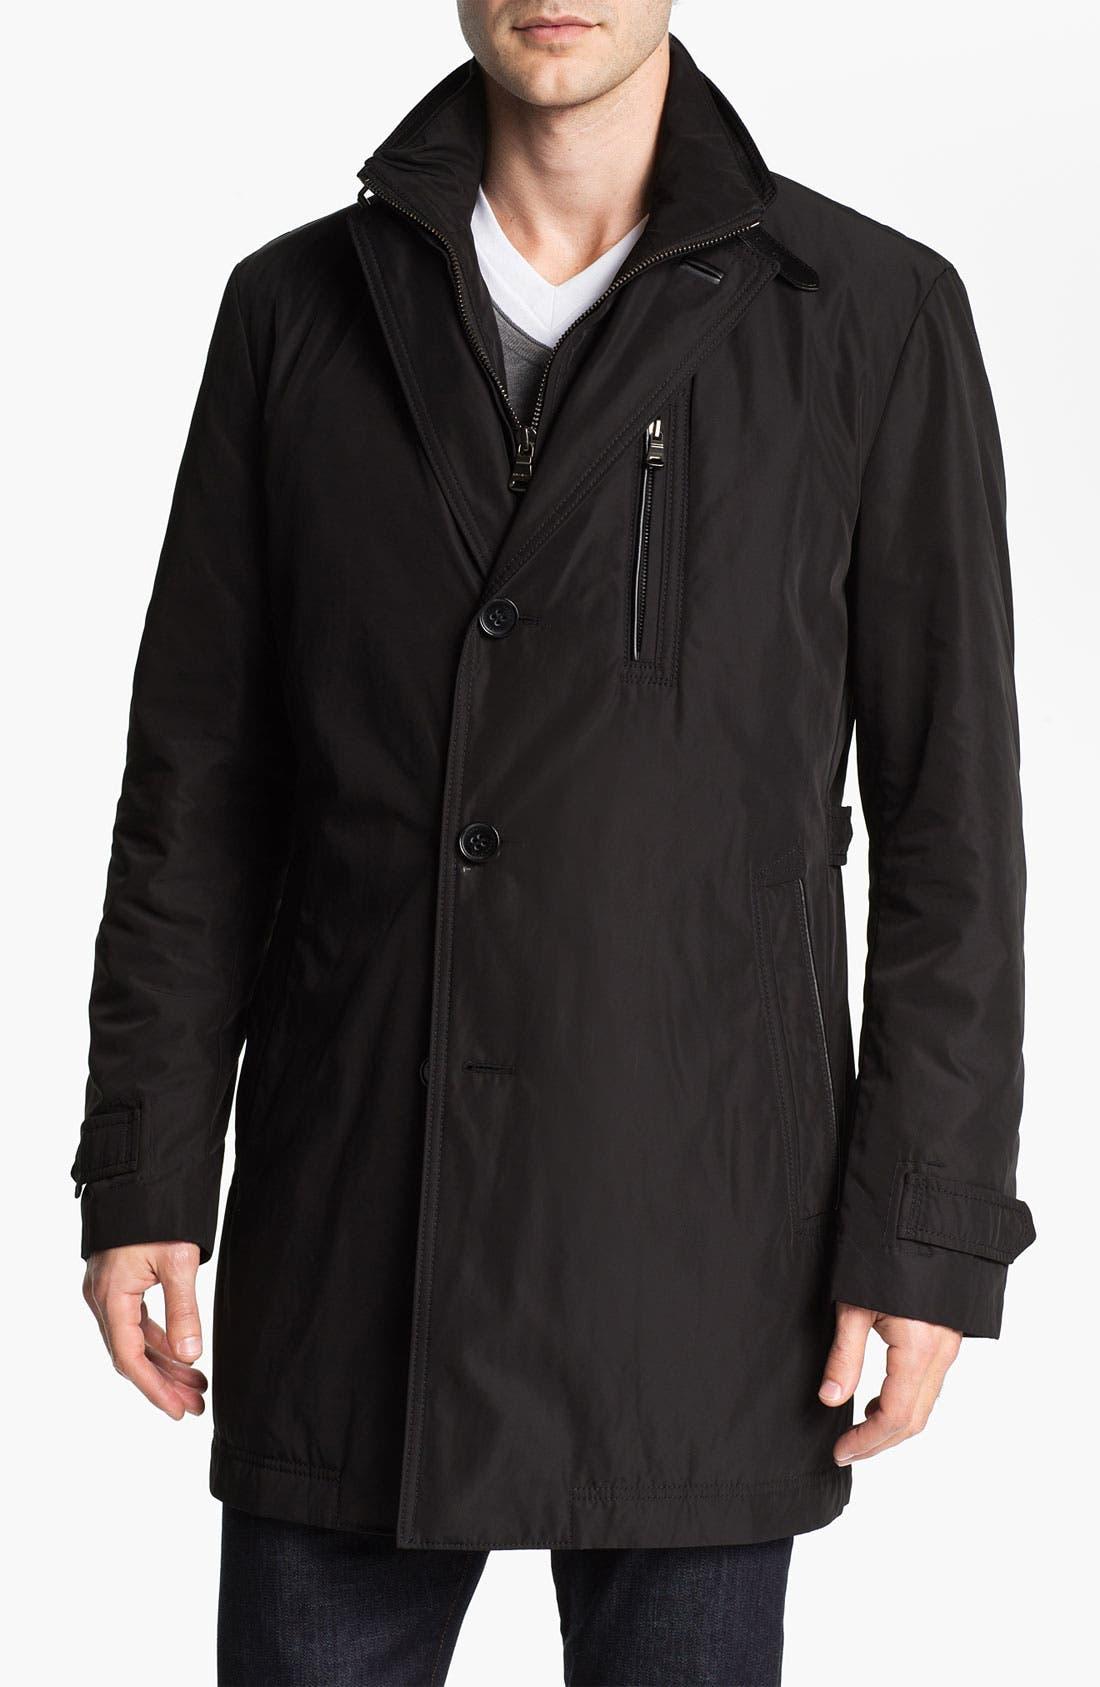 Alternate Image 1 Selected - BOSS Black 'Zenim' Jacket